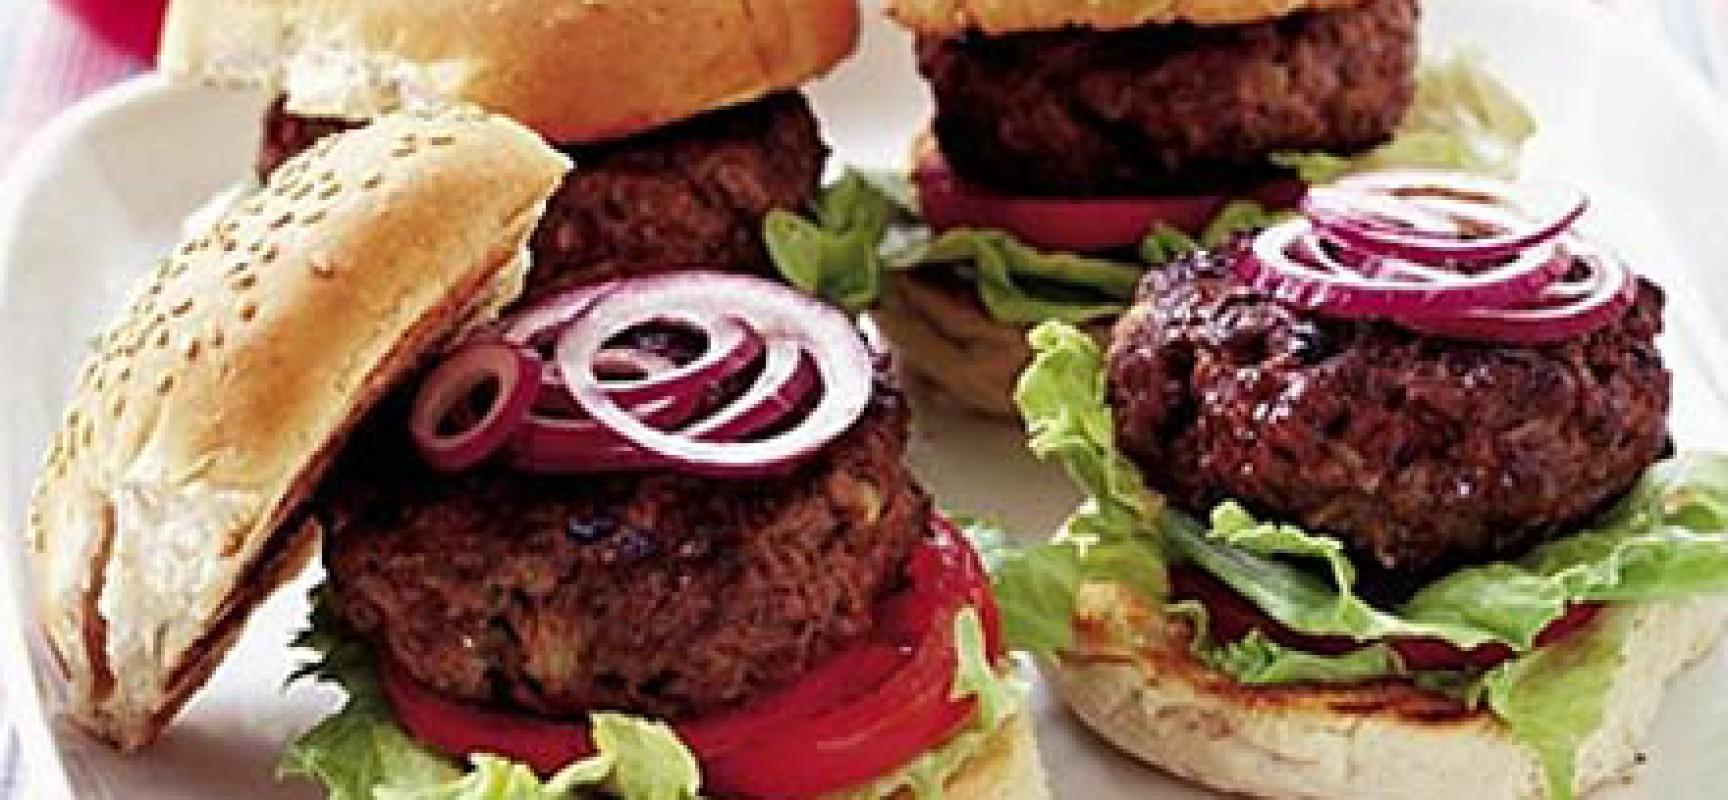 Burger Urges!!